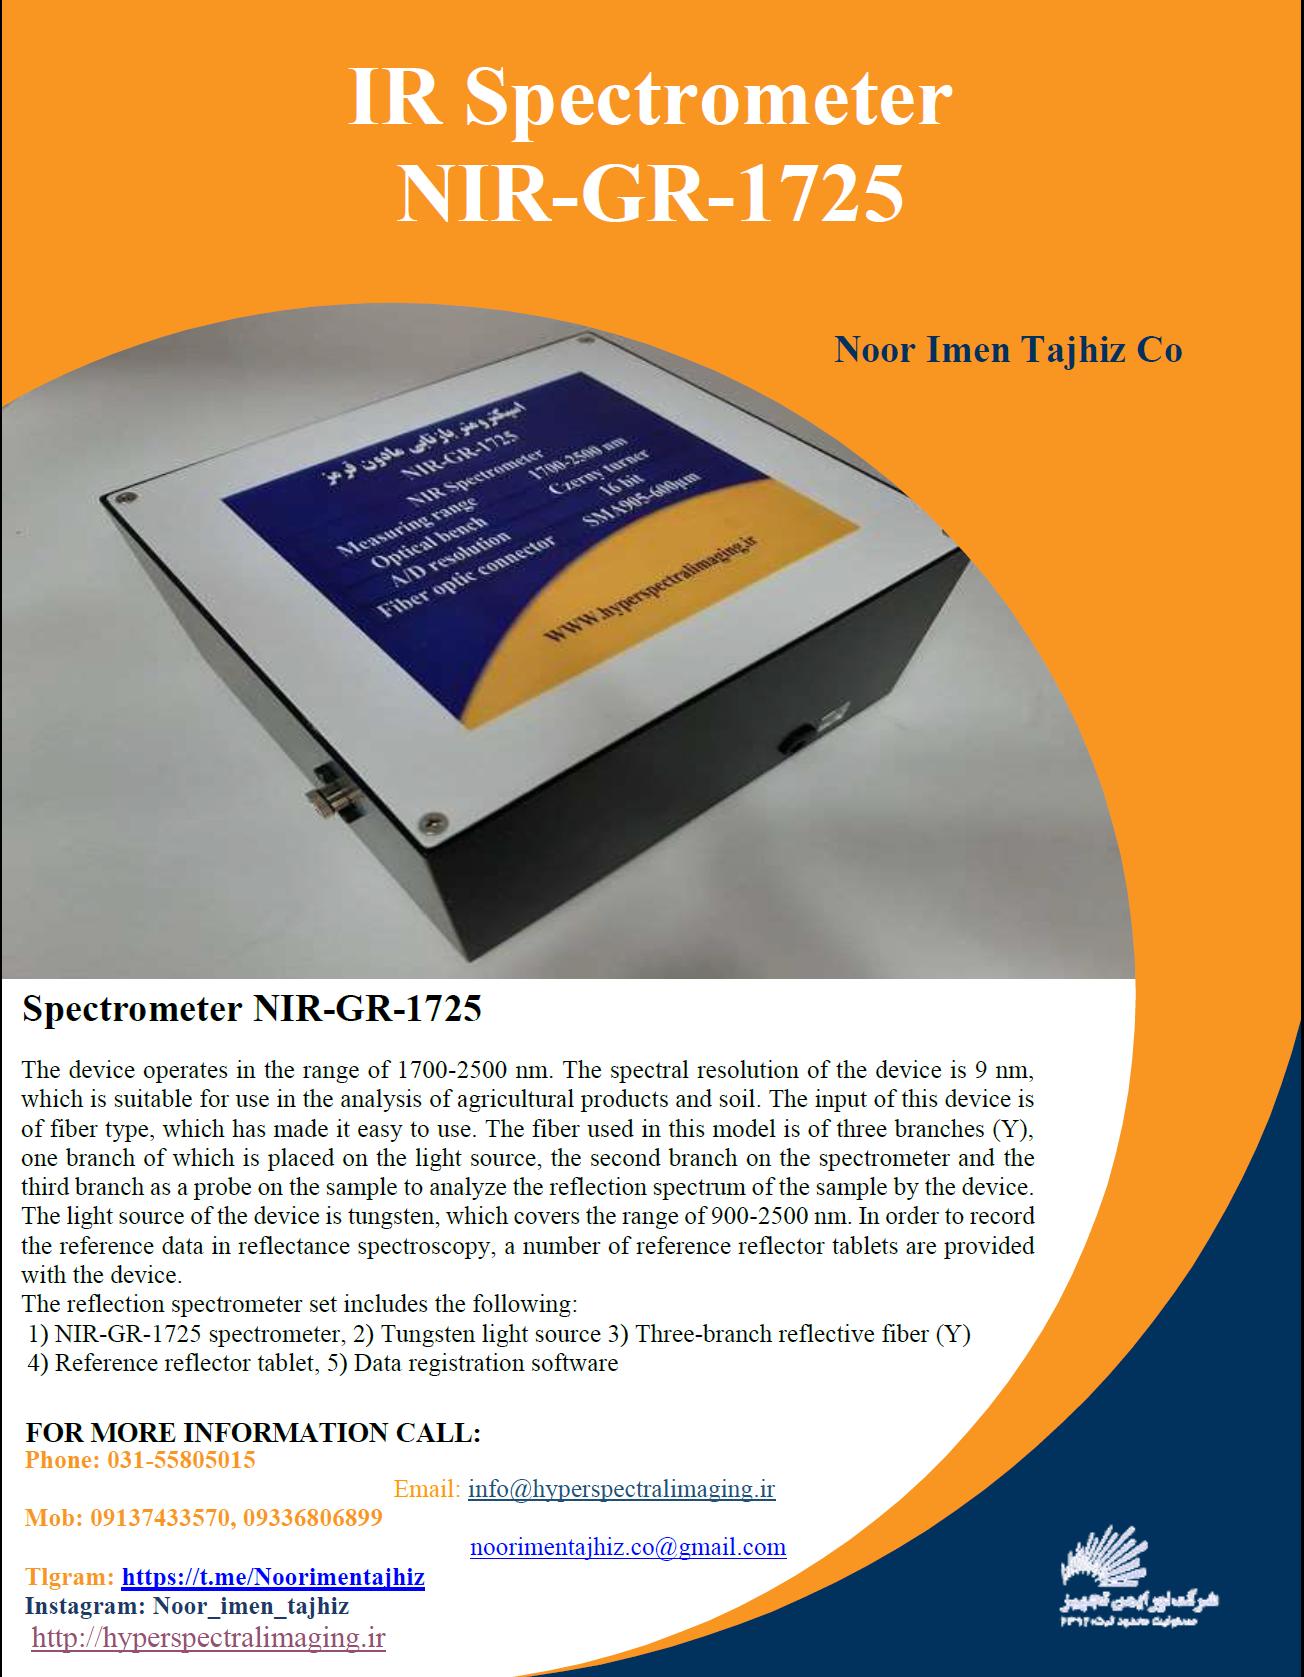 NIR-GR-1725